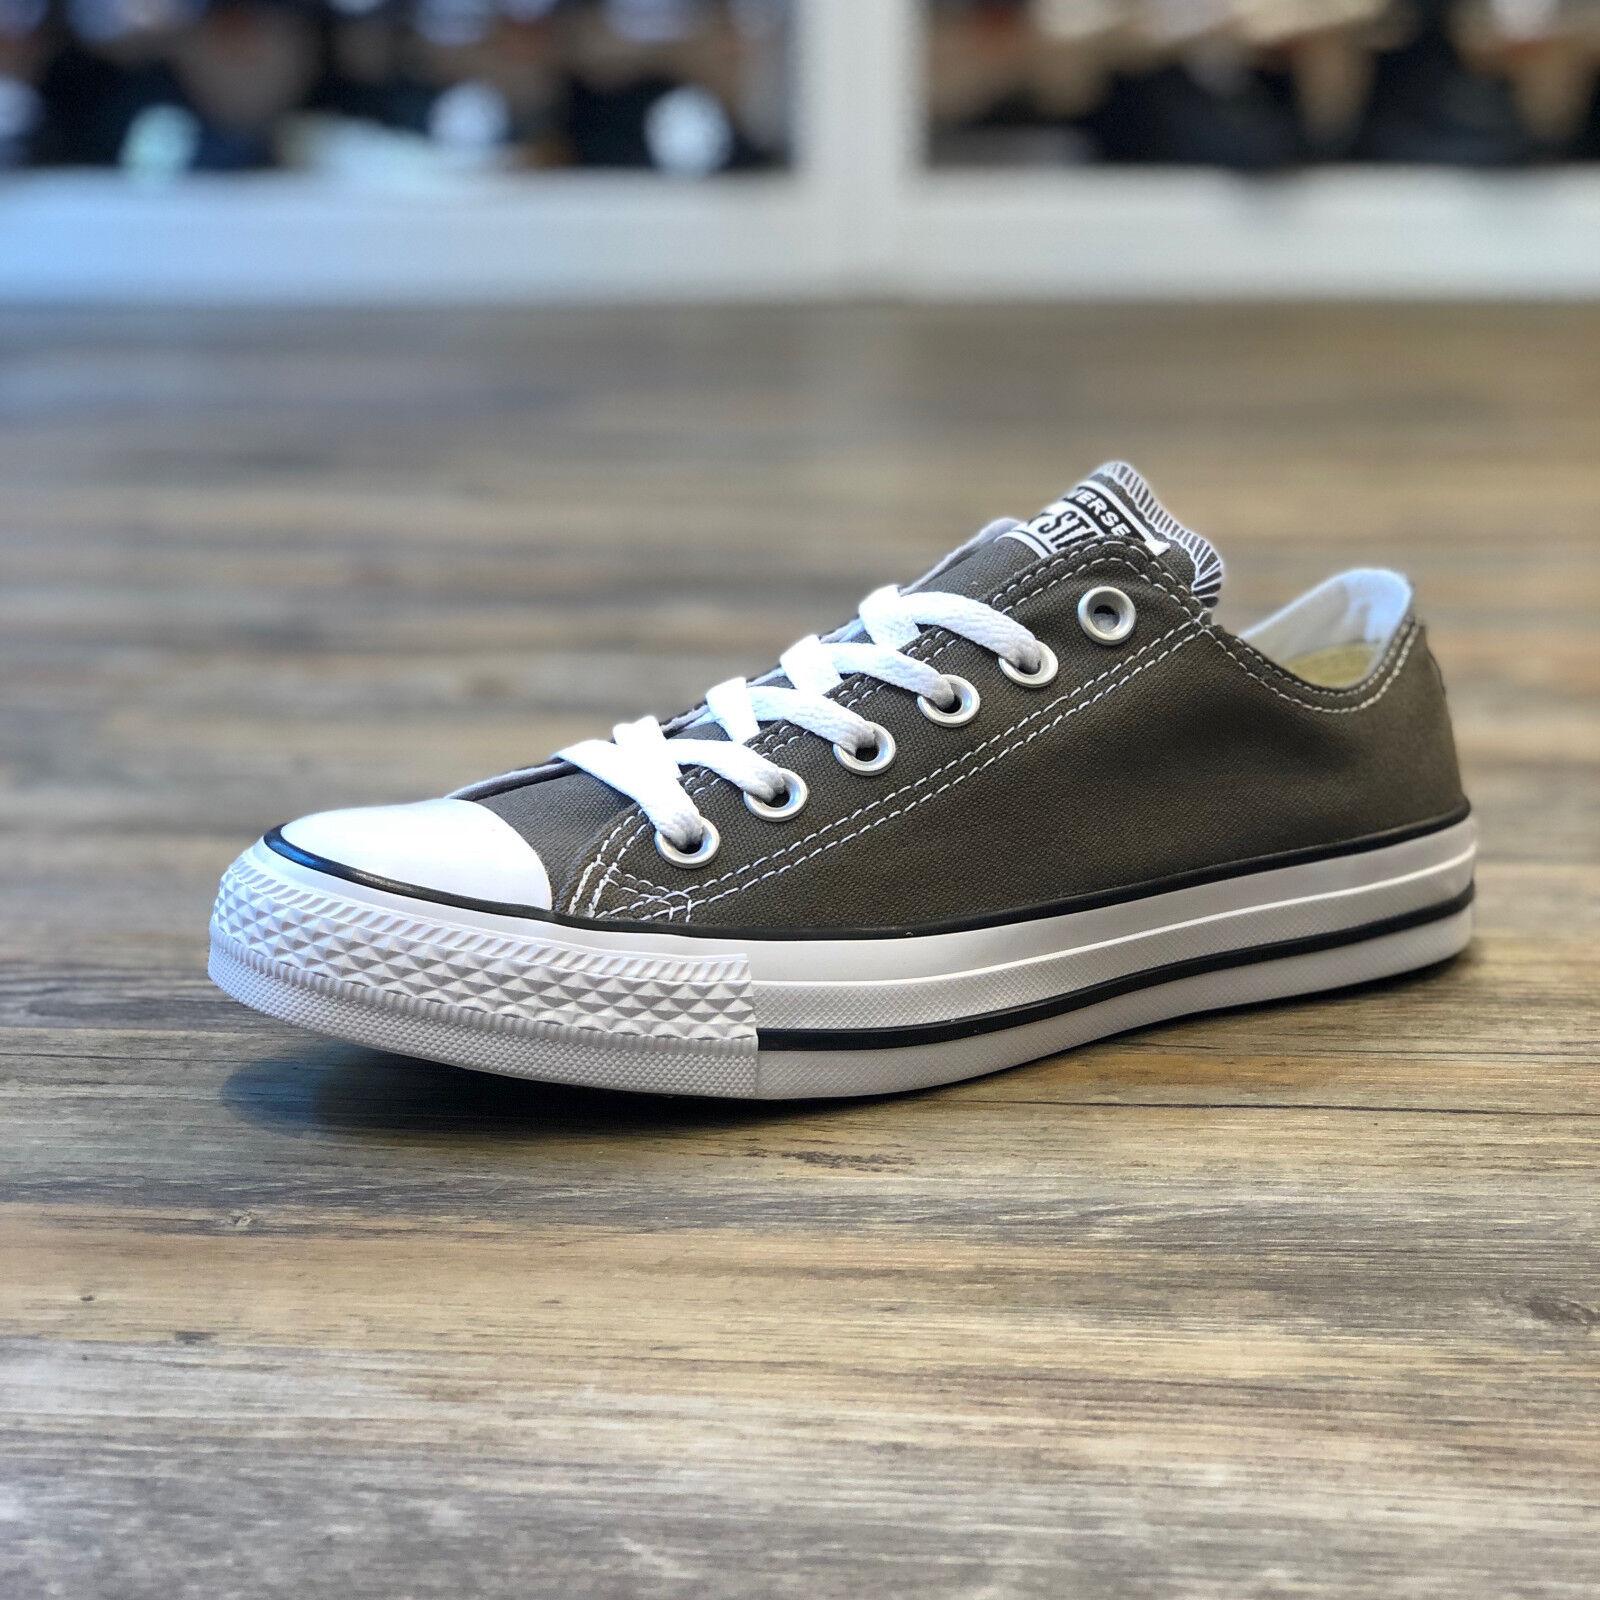 Converse Bll Star OS Low Gr.40 grau Schuhe Turn Sneaker Charcoal Damen 1J794C